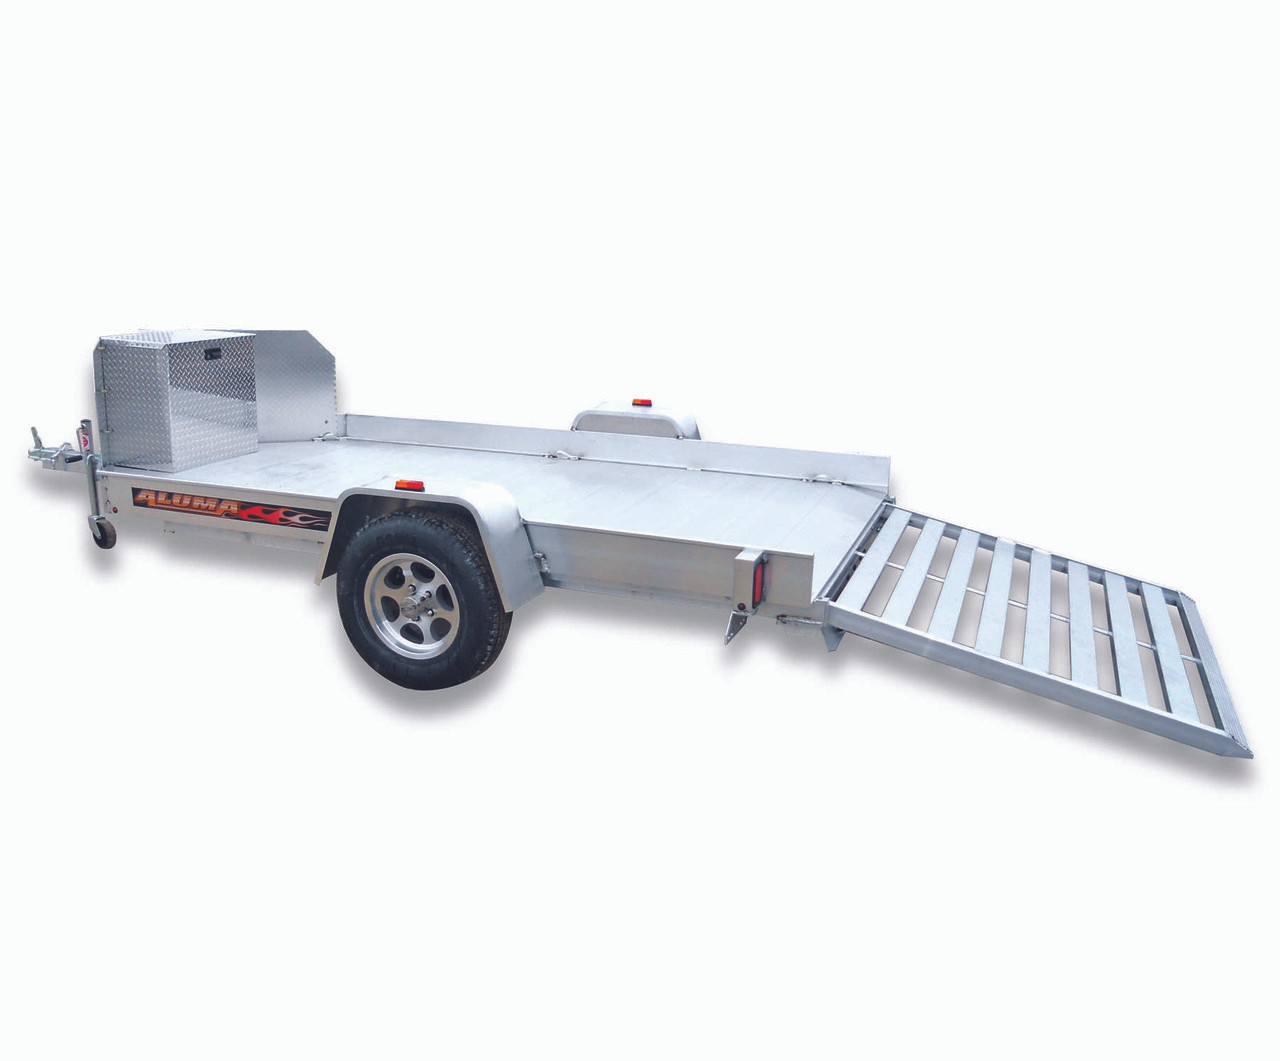 "ALUT12 --- 77"" x 151"" Aluminum ATV Trailer with Ramp Gate"